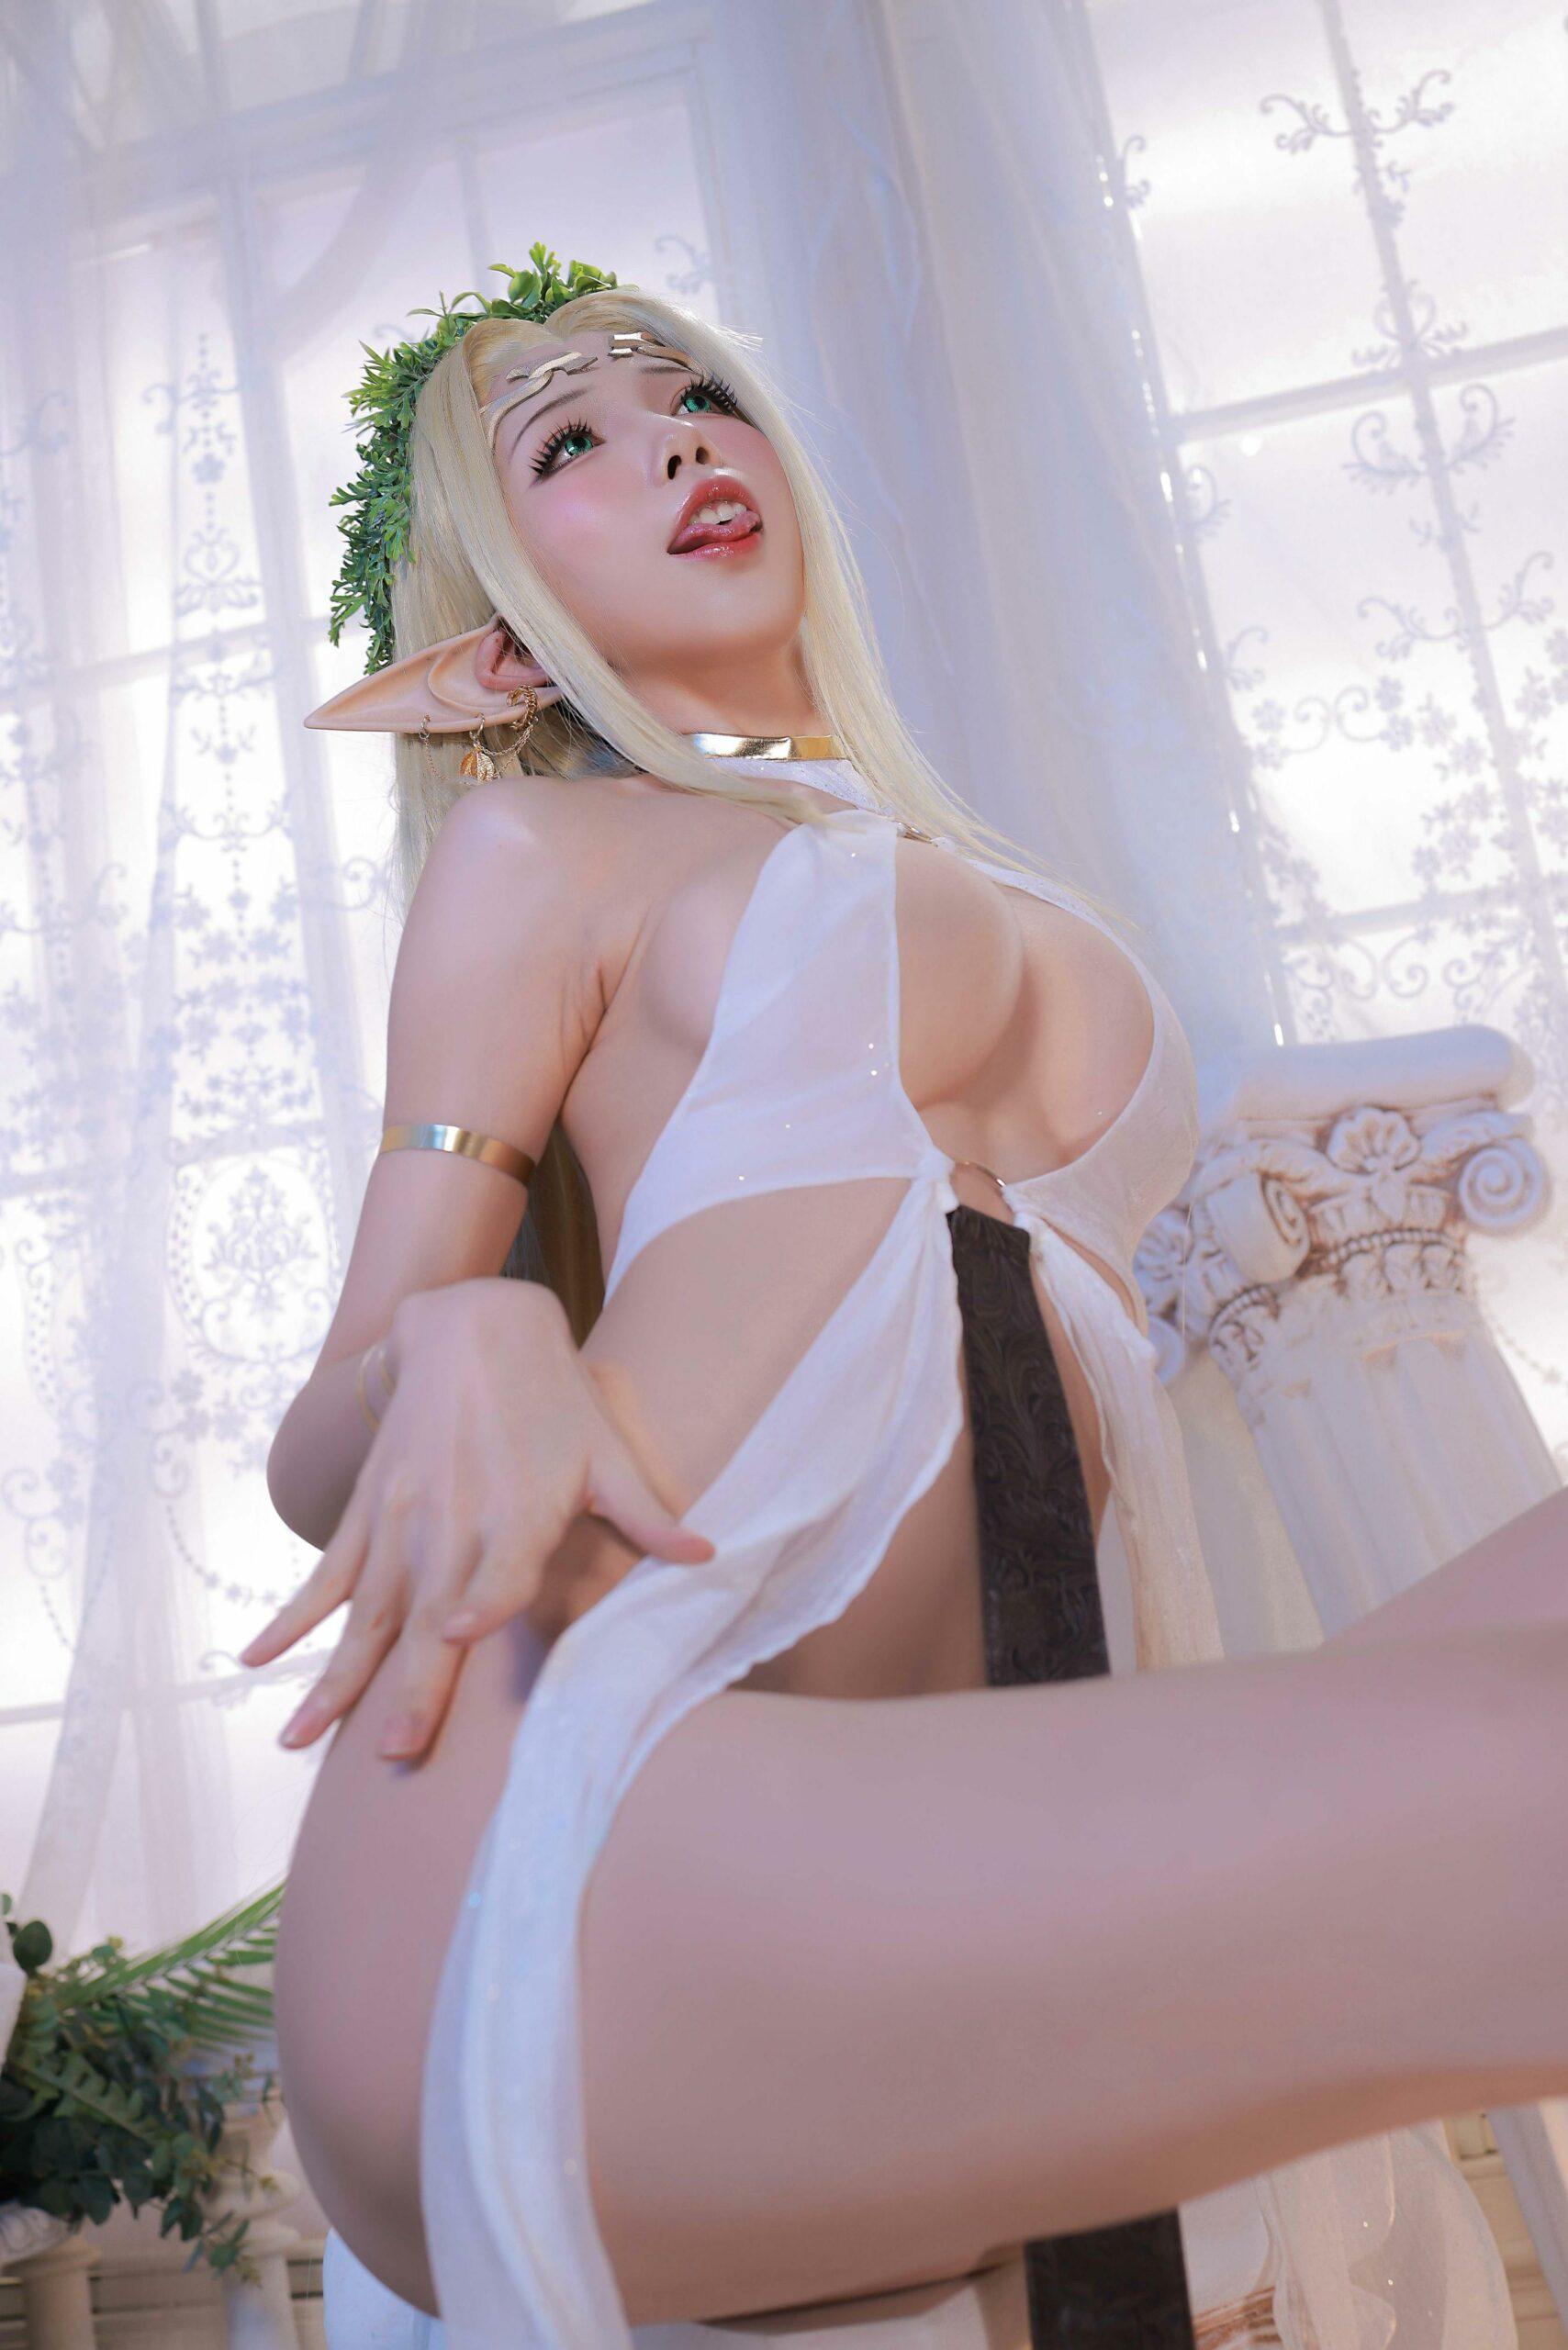 Kuroinu Celestine Cosplay by Aqua 43